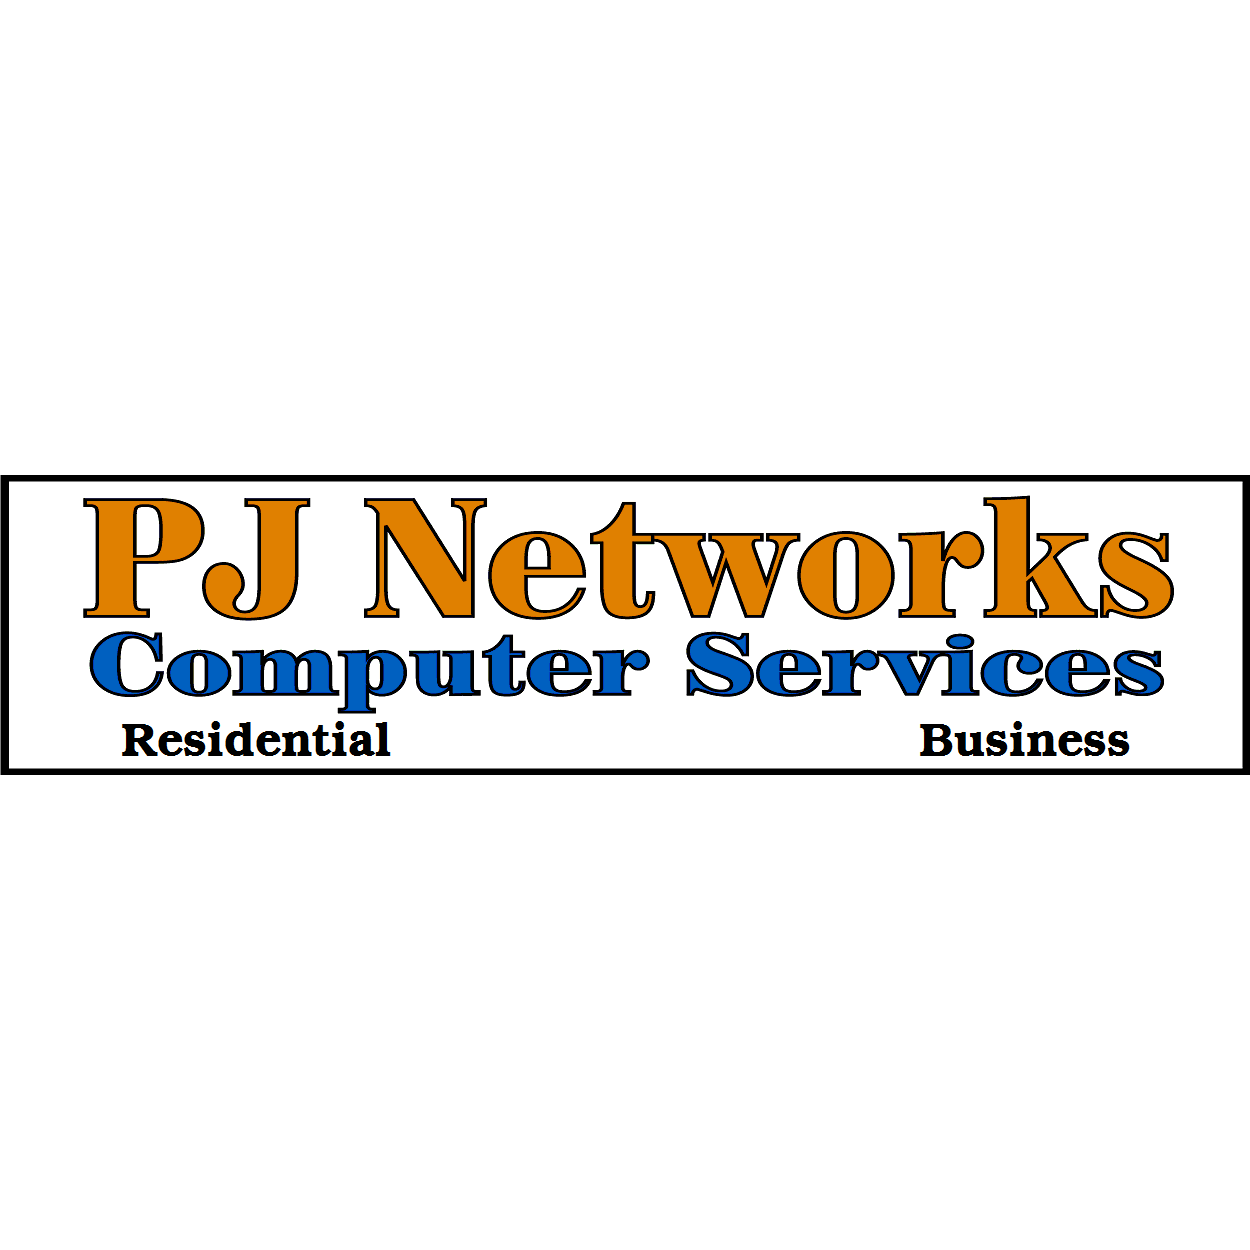 Pj Networks Computer Services - Ruckersville